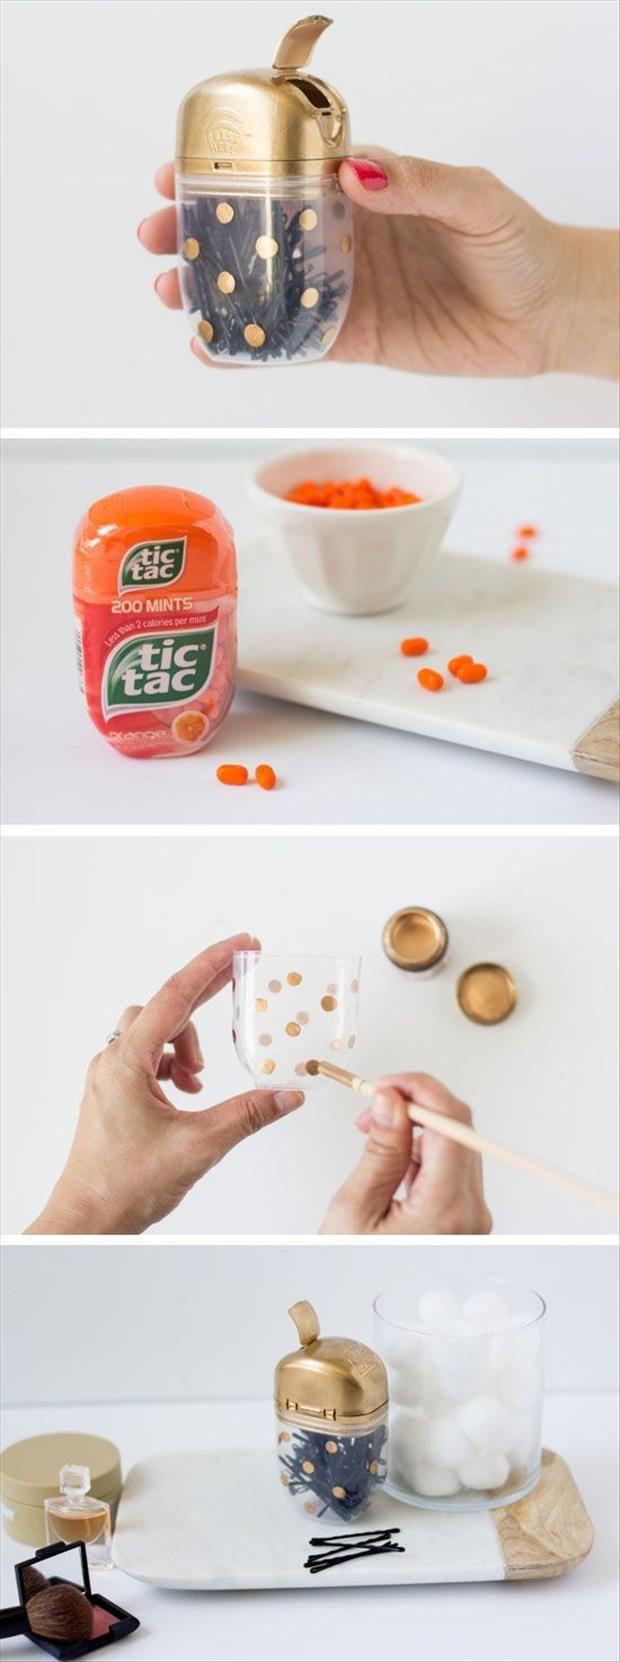 artesanato (7) embalagem de tic tac